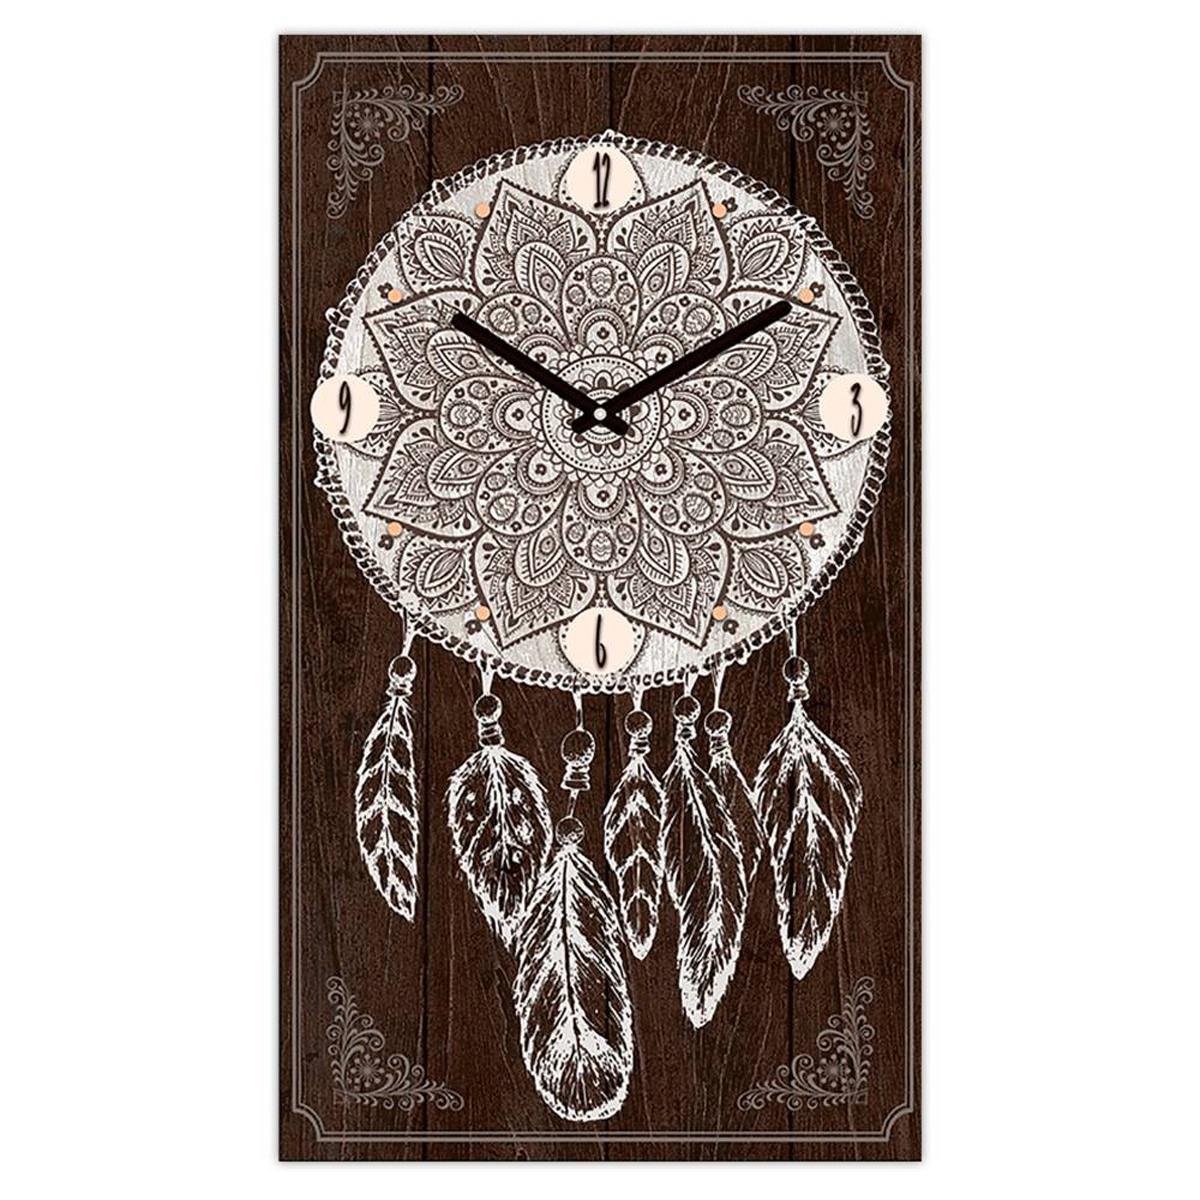 Horloge Murale \'Boho\' marron (dreamcatcher) - 49x28 cm - [Q3248]